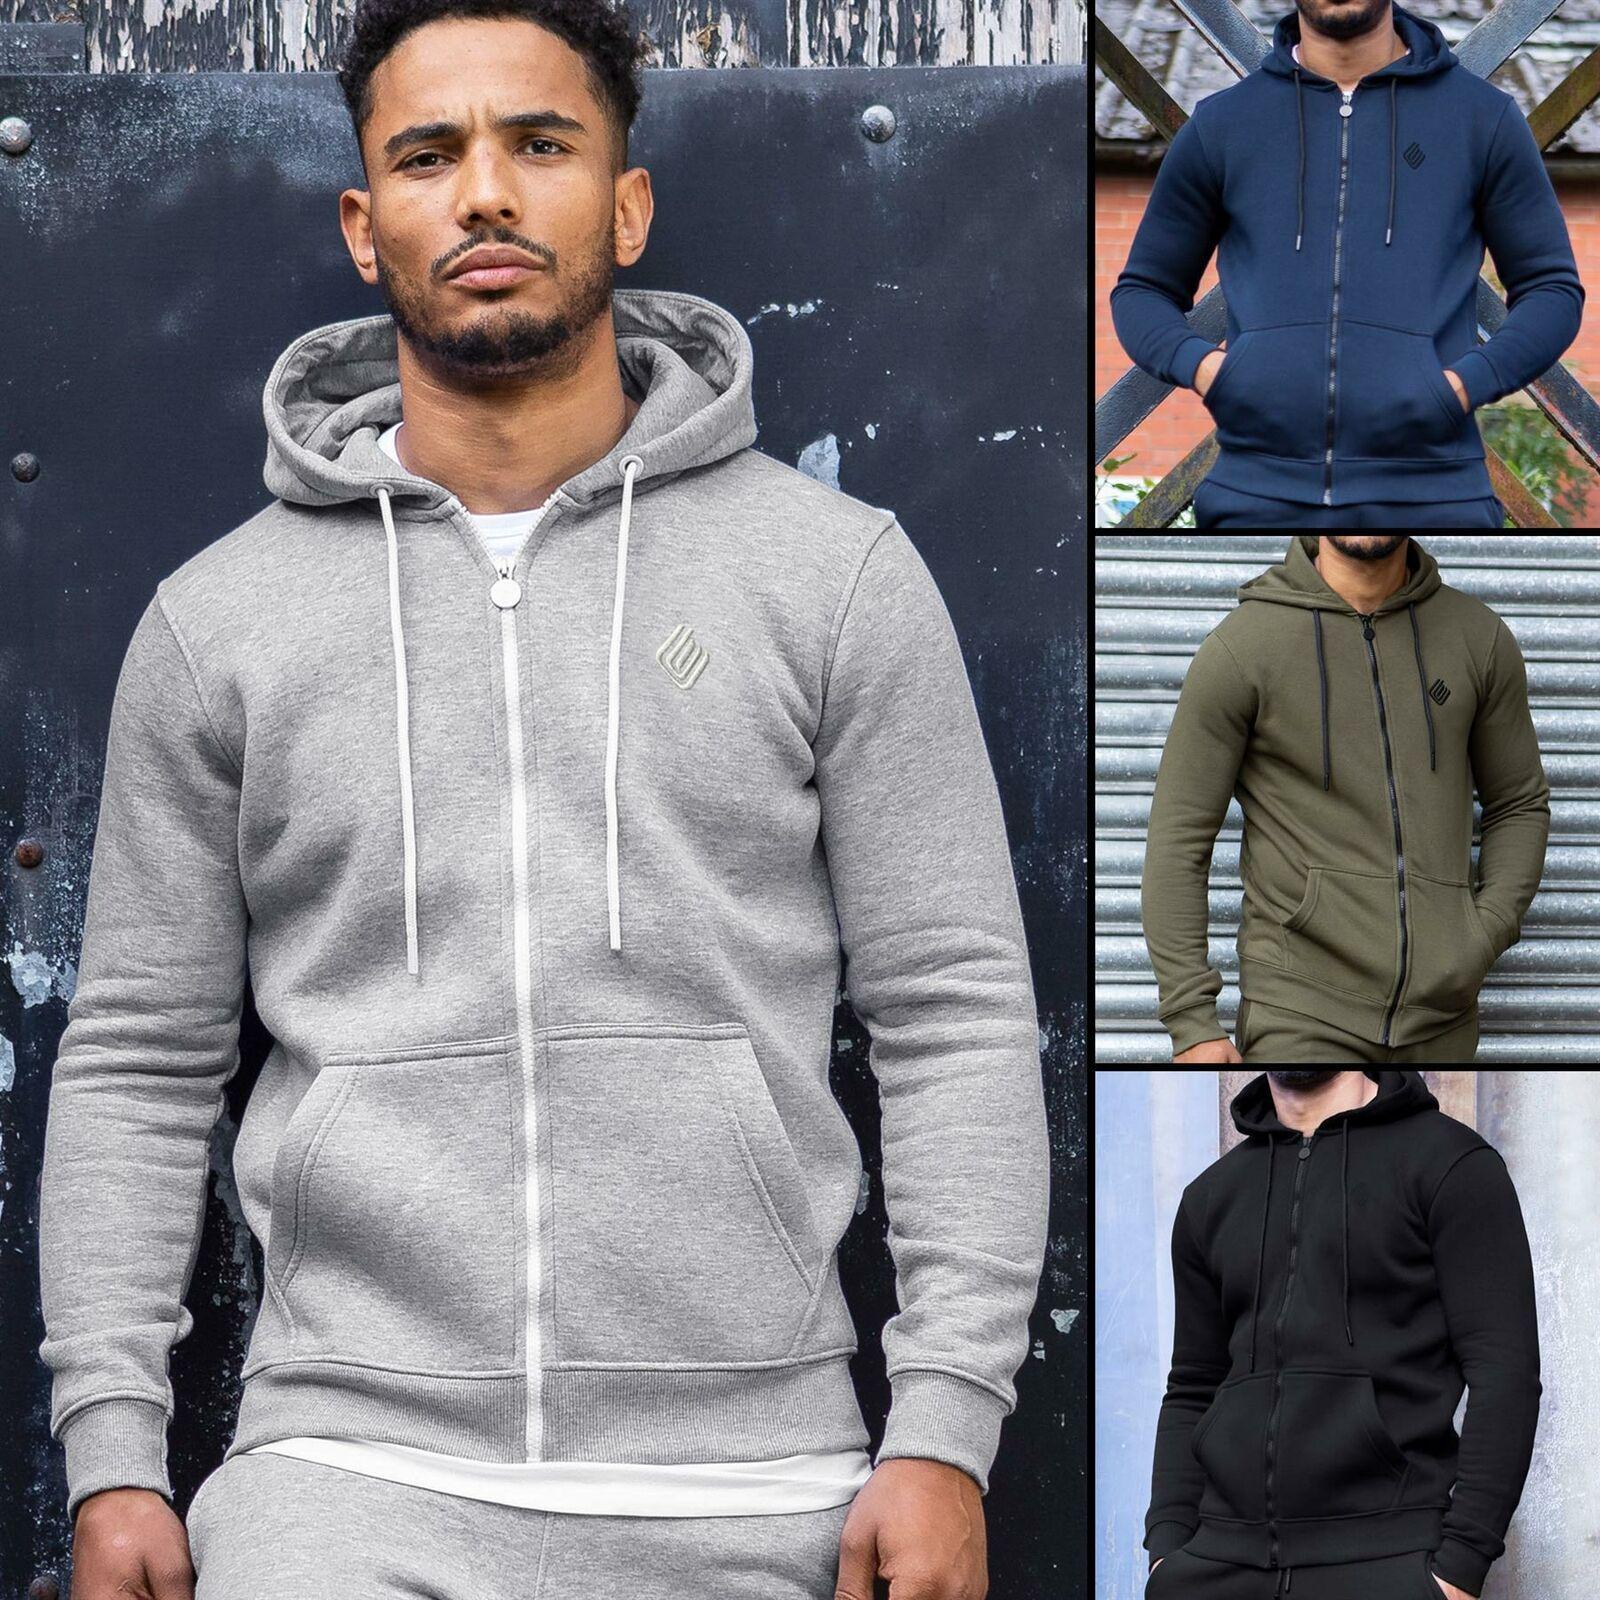 Mens Hoodie Zip Up Hooded Fleece Hoody Coat Winter Warm Jacket Top By Enzo Jeans